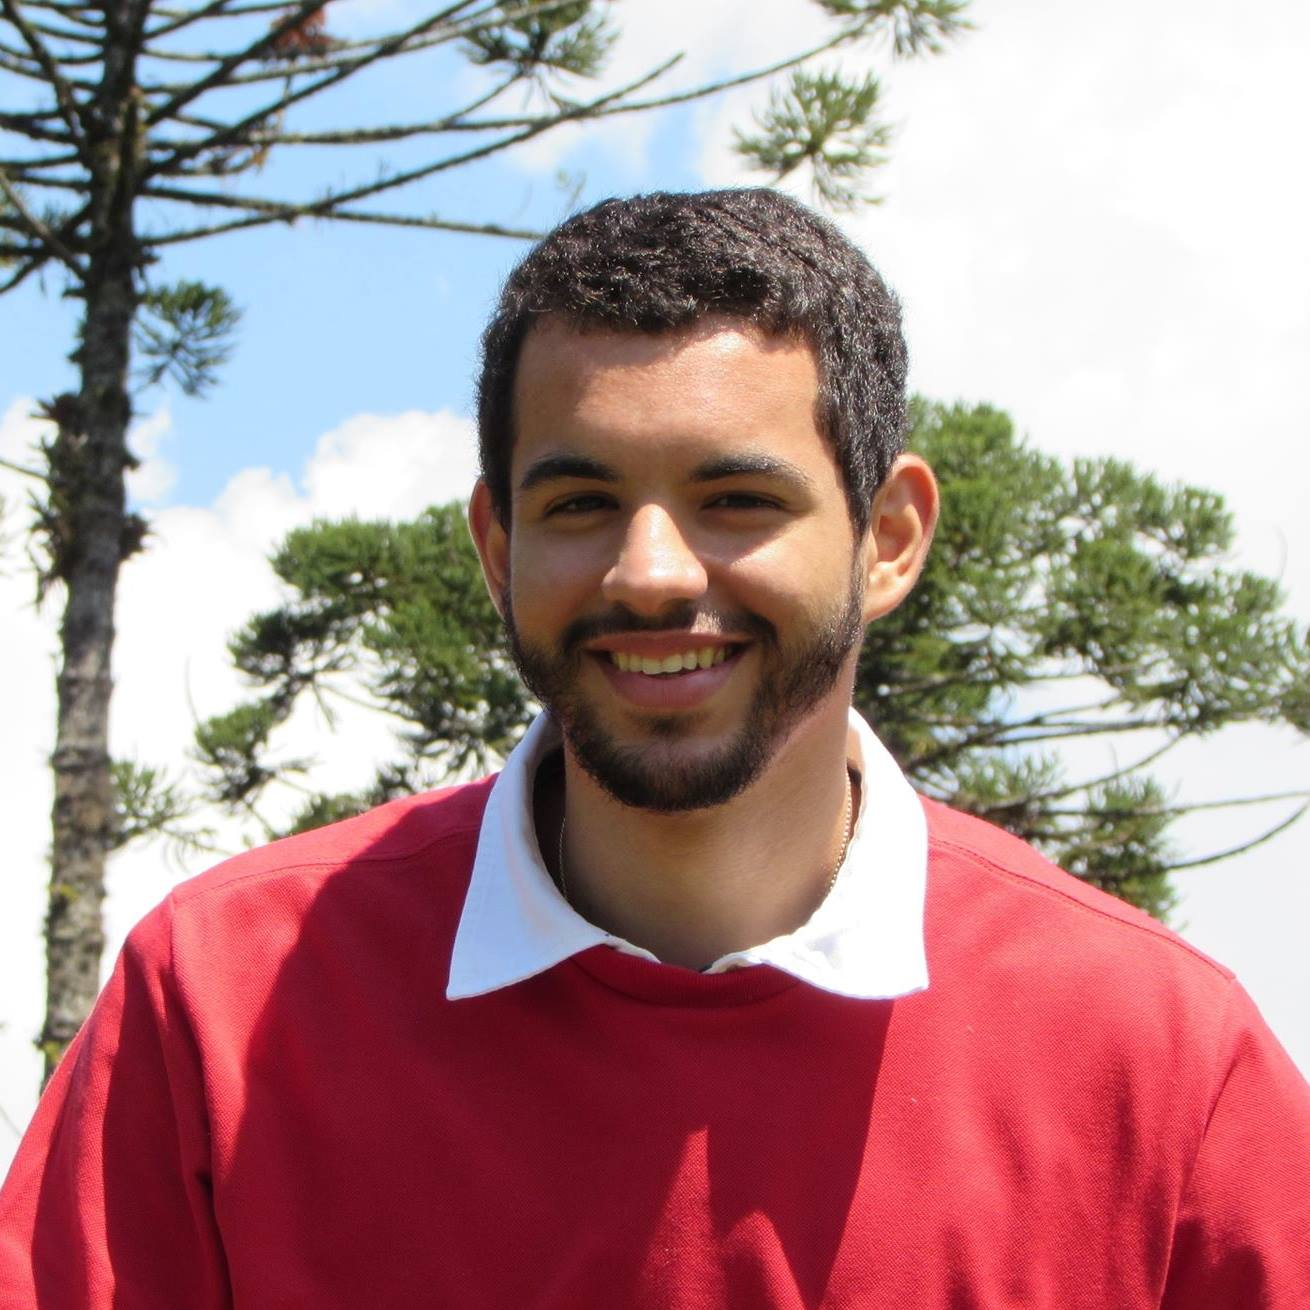 ENTREVISTA: Matheus Gorito - Aprovado no concurso do Banco do Brasil para o cargo de Escriturário